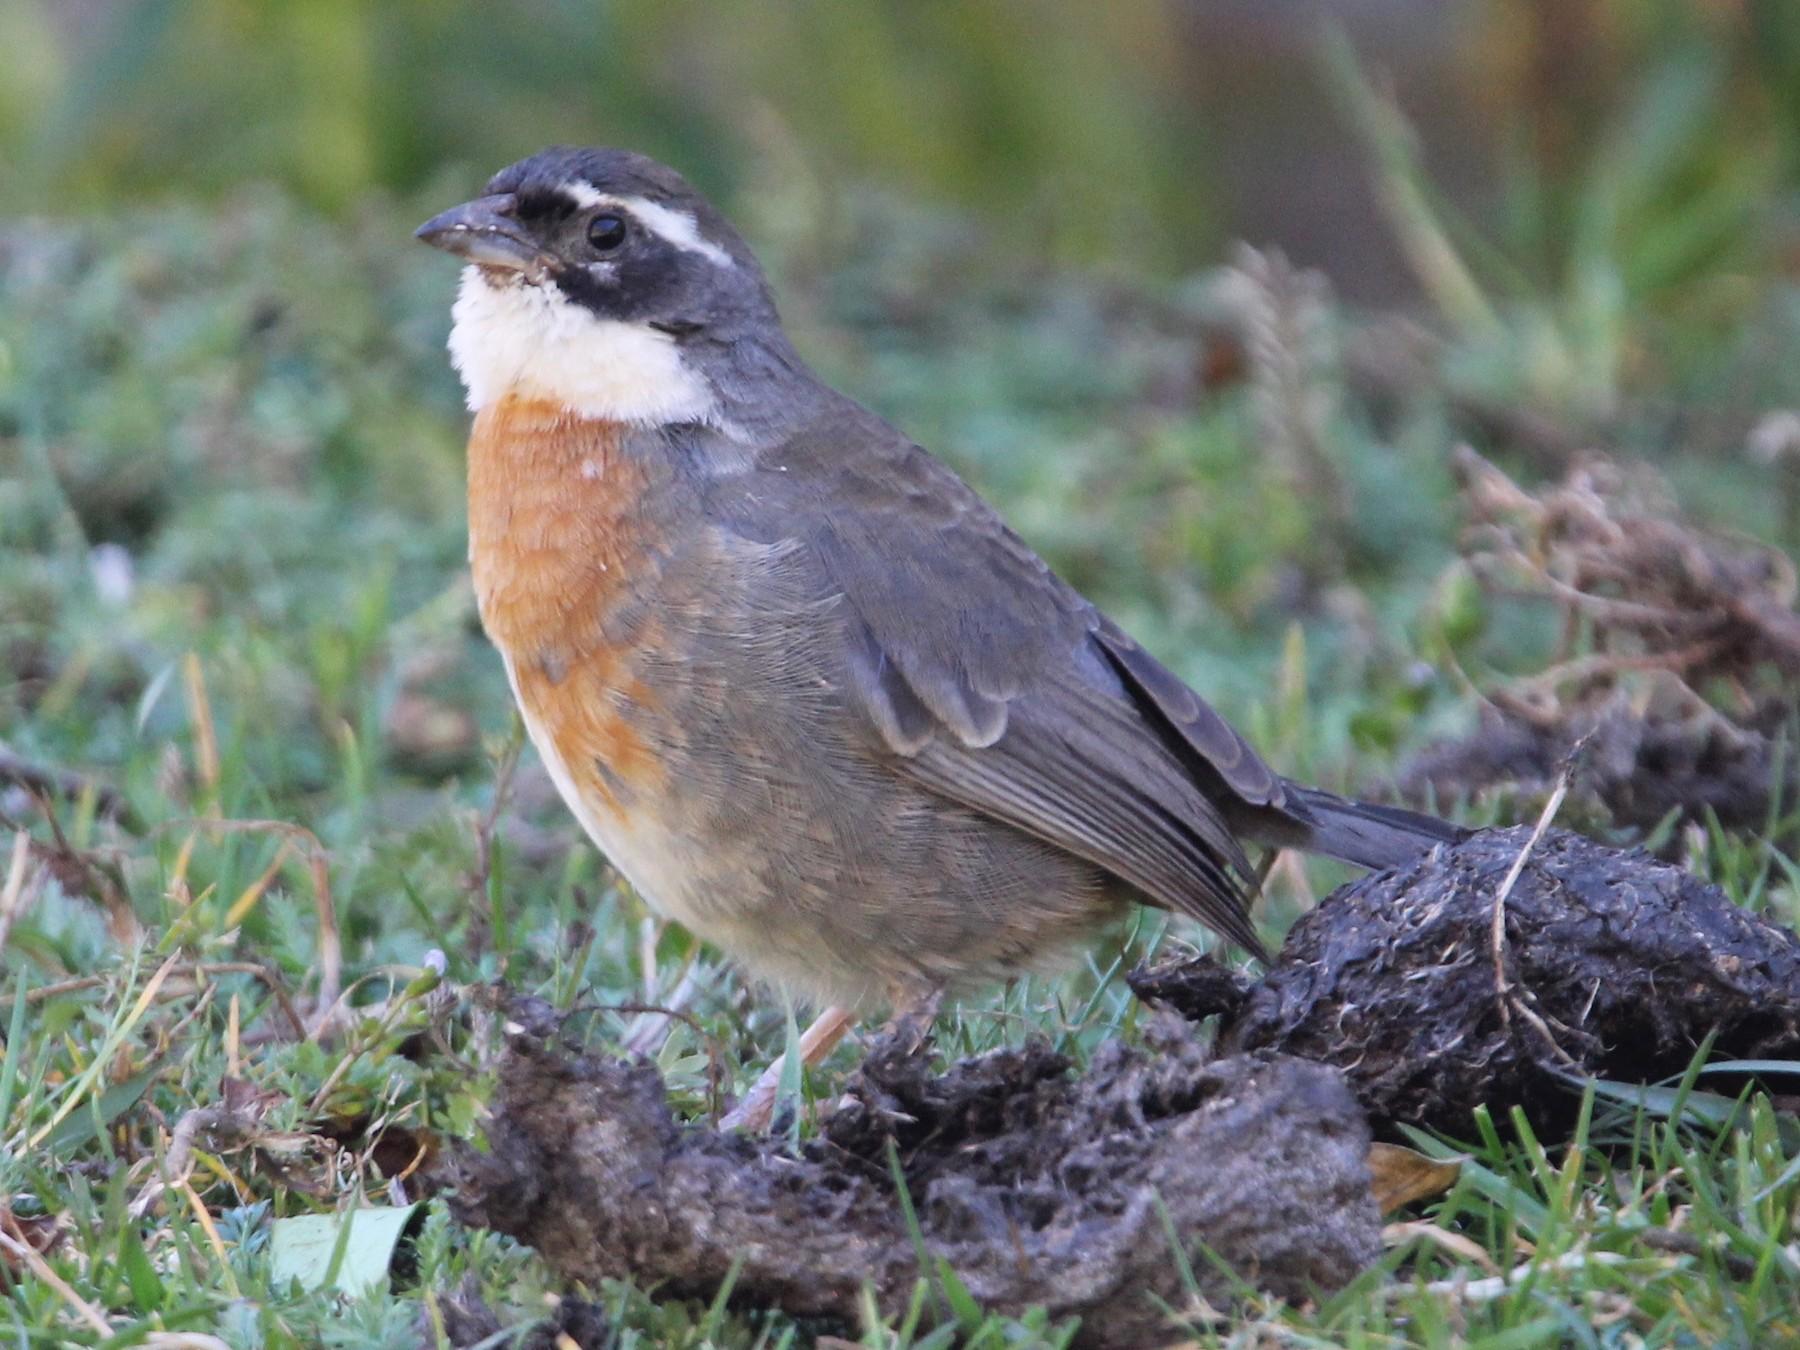 Chestnut-breasted Mountain-Finch - Robert Gowan